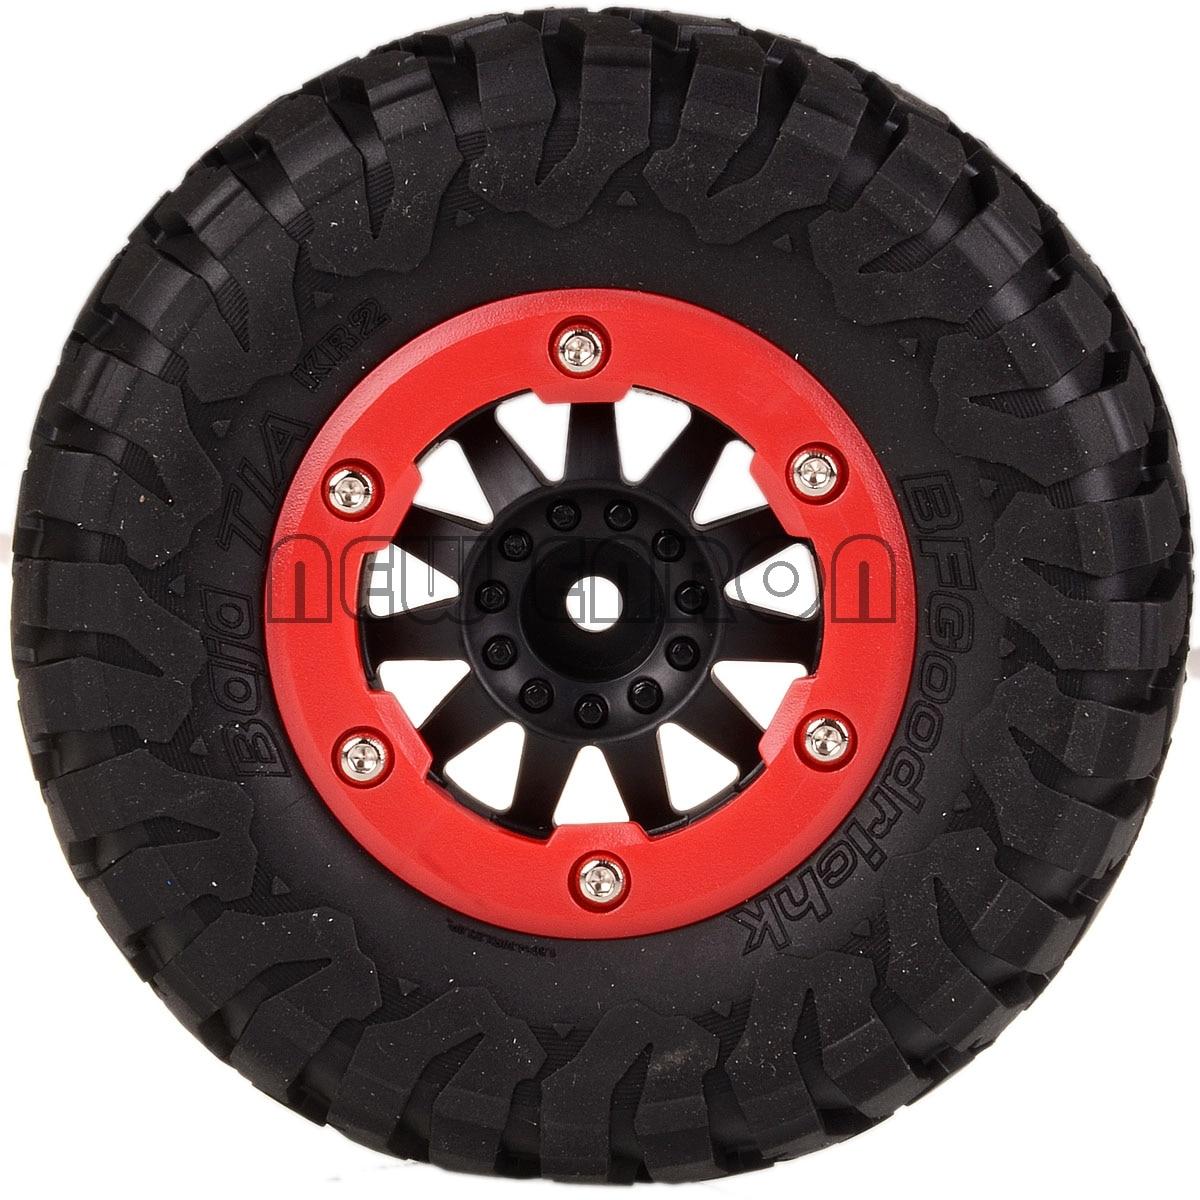 NEW ENRON Course & Bead-Lock Wheel Rims Hub 12MM FOR TRAXXAS 10SC HPI